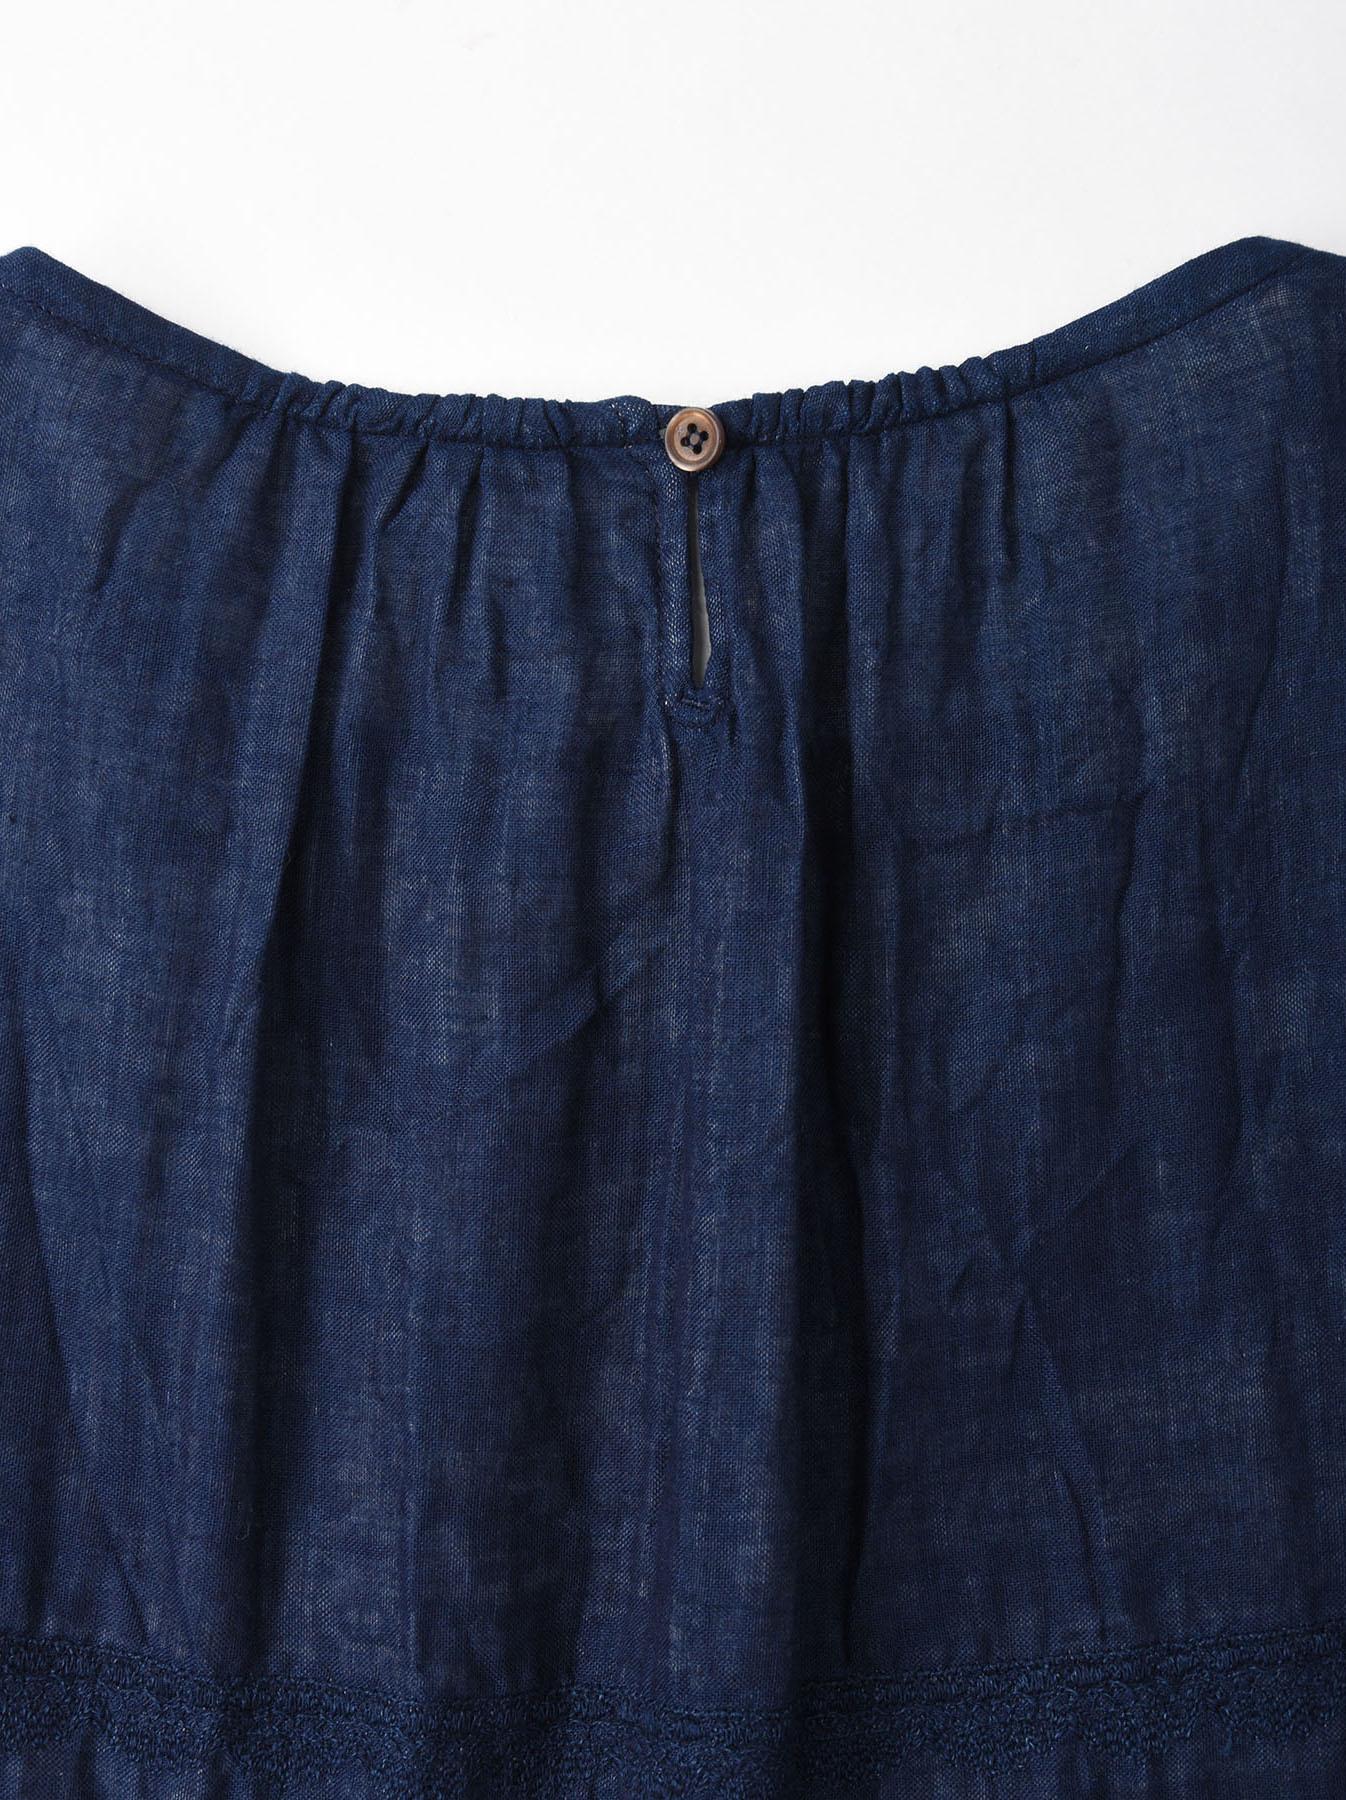 Indigo Double Cloth Lace Embroidery Dress-9